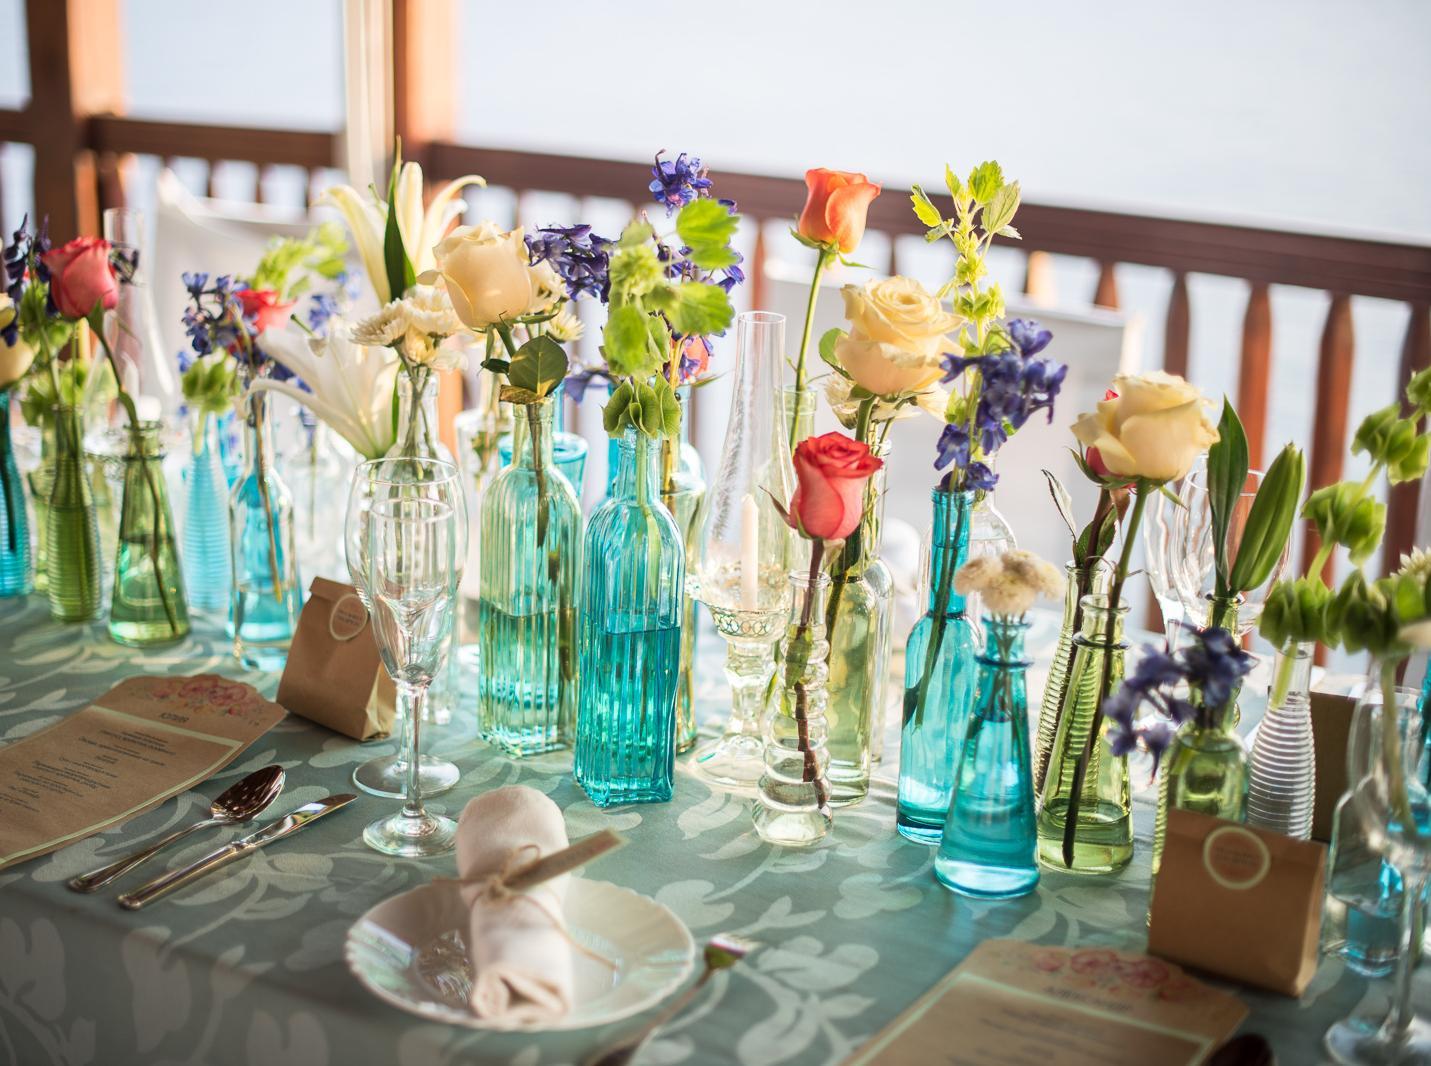 Matrimonio Tema Idea : Matrimonio tema tropical las mejores ideas sobre